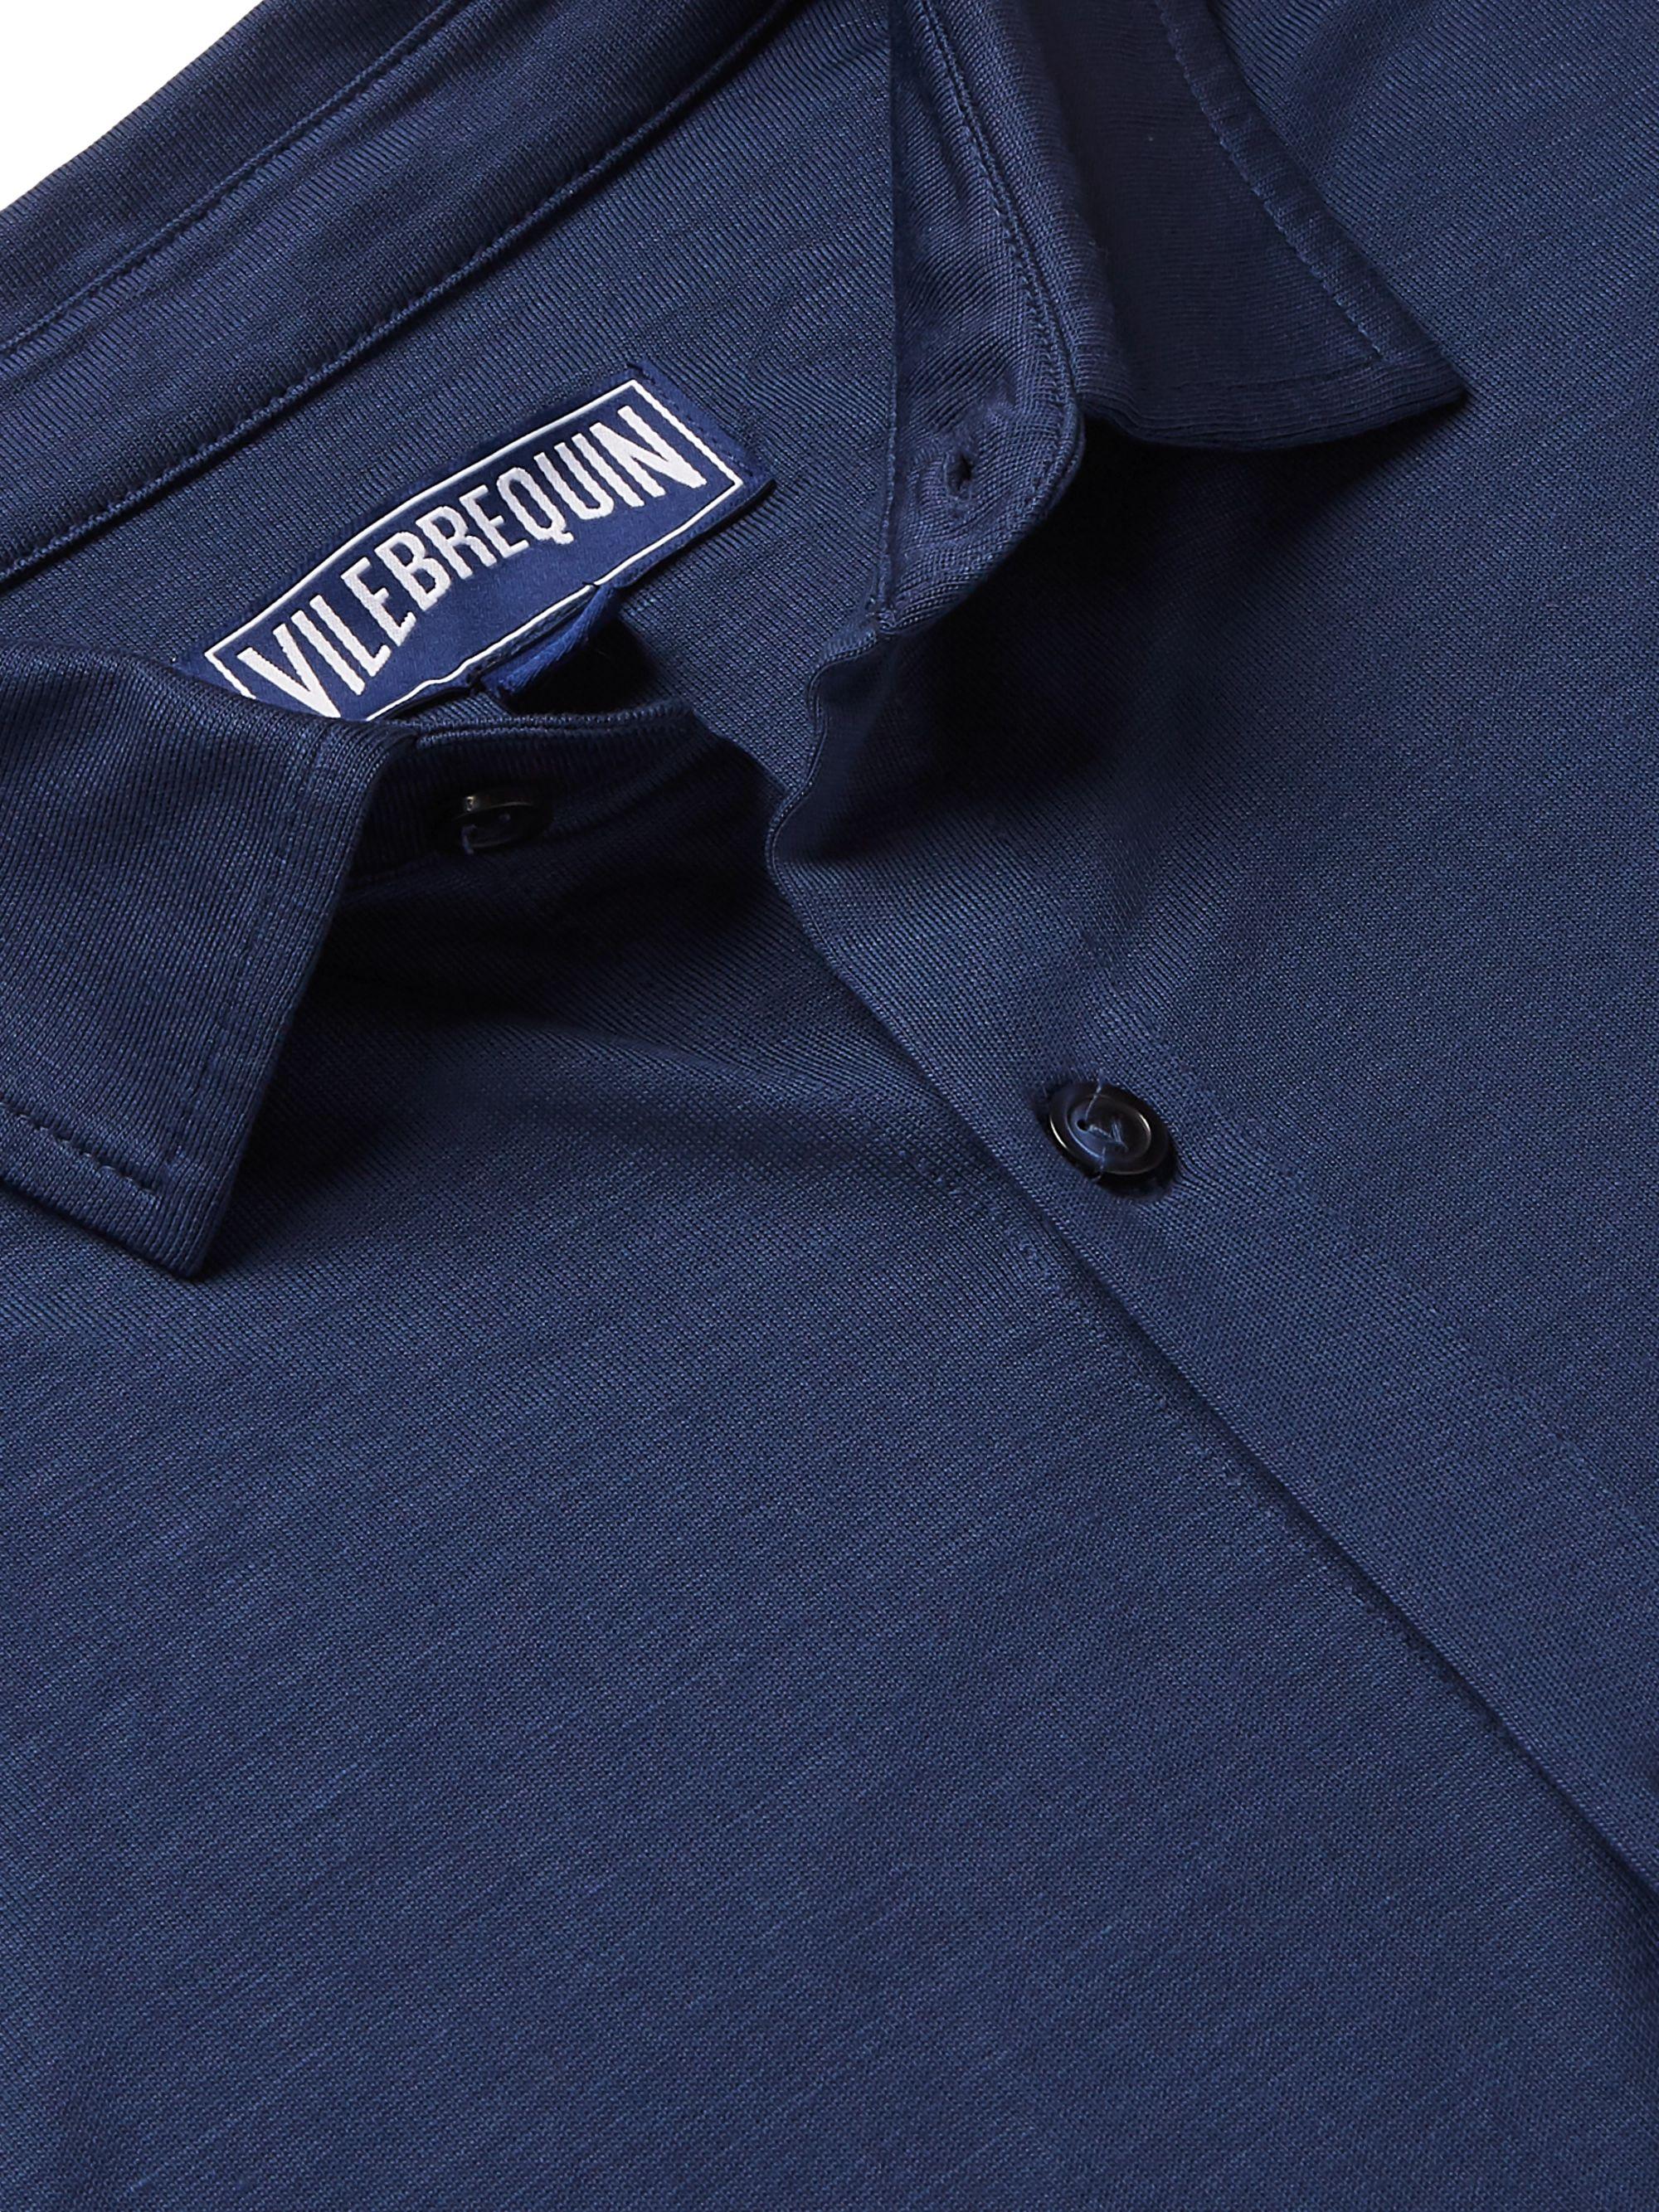 Navy Calandre Tencel Shirt | Vilebrequin